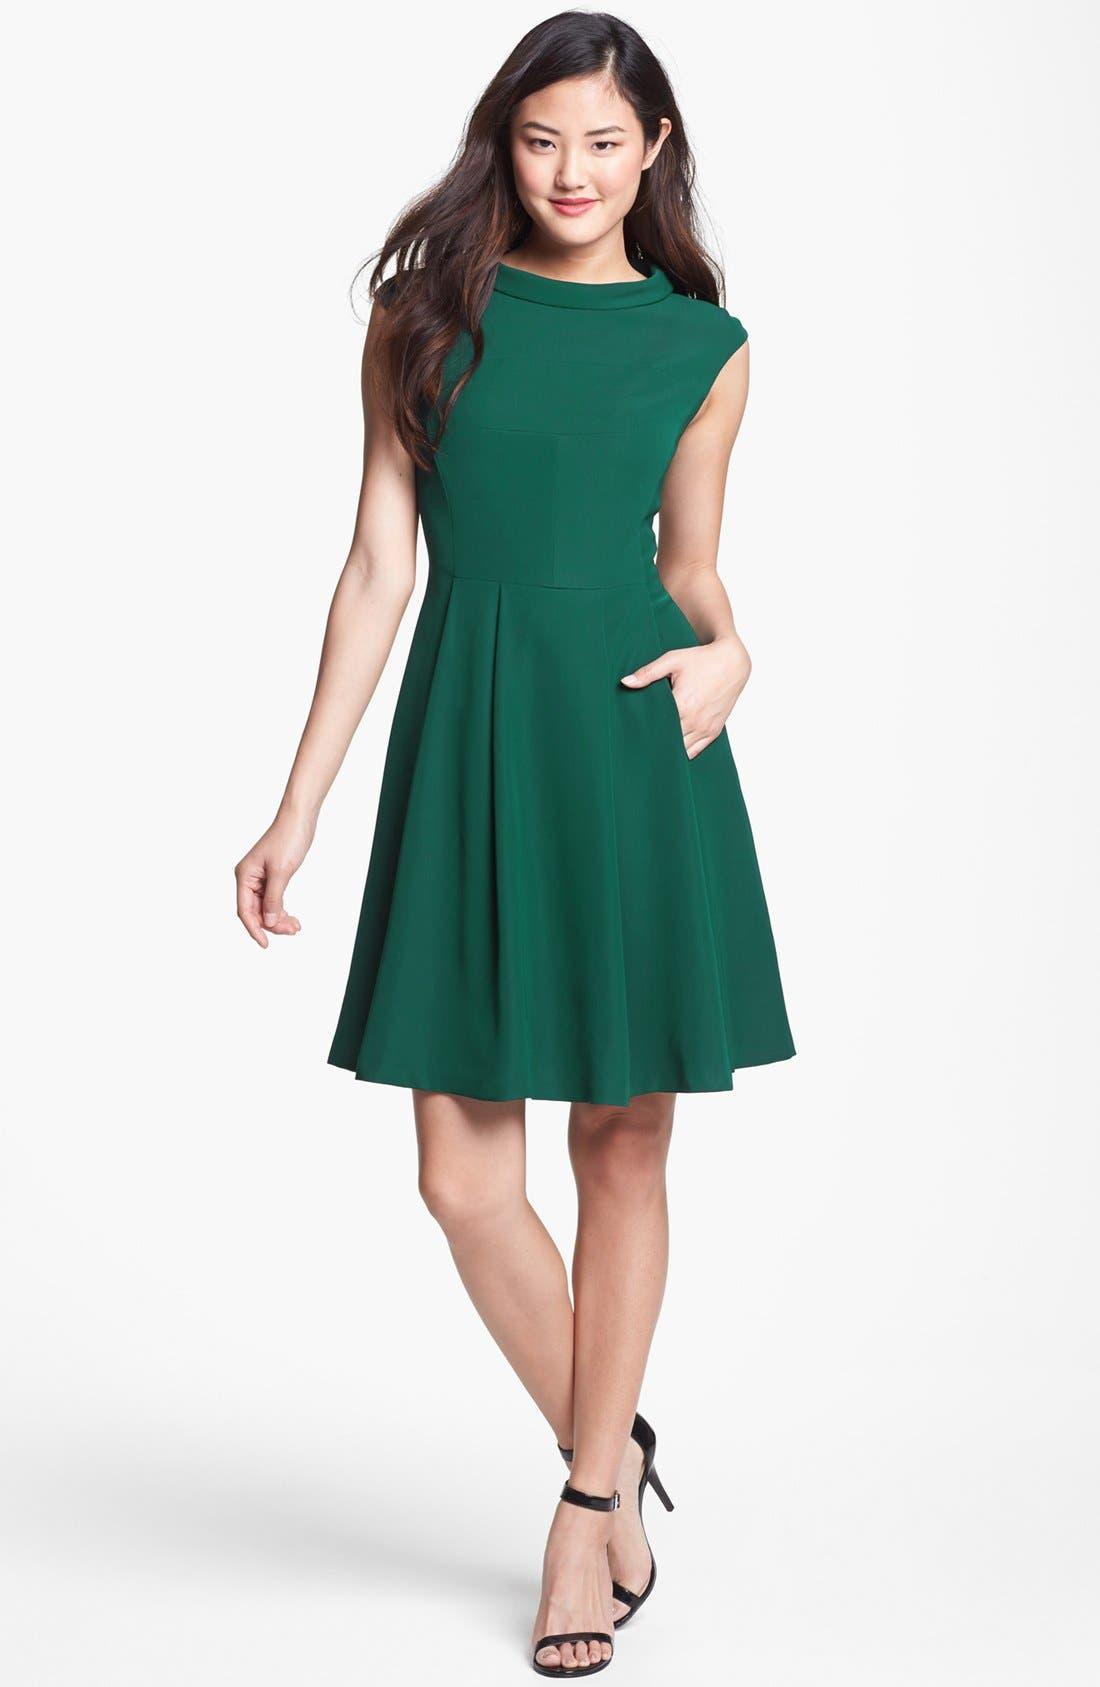 Alternate Image 1 Selected - Vince Camuto Fit & Flare Dress (Regular & Petite)